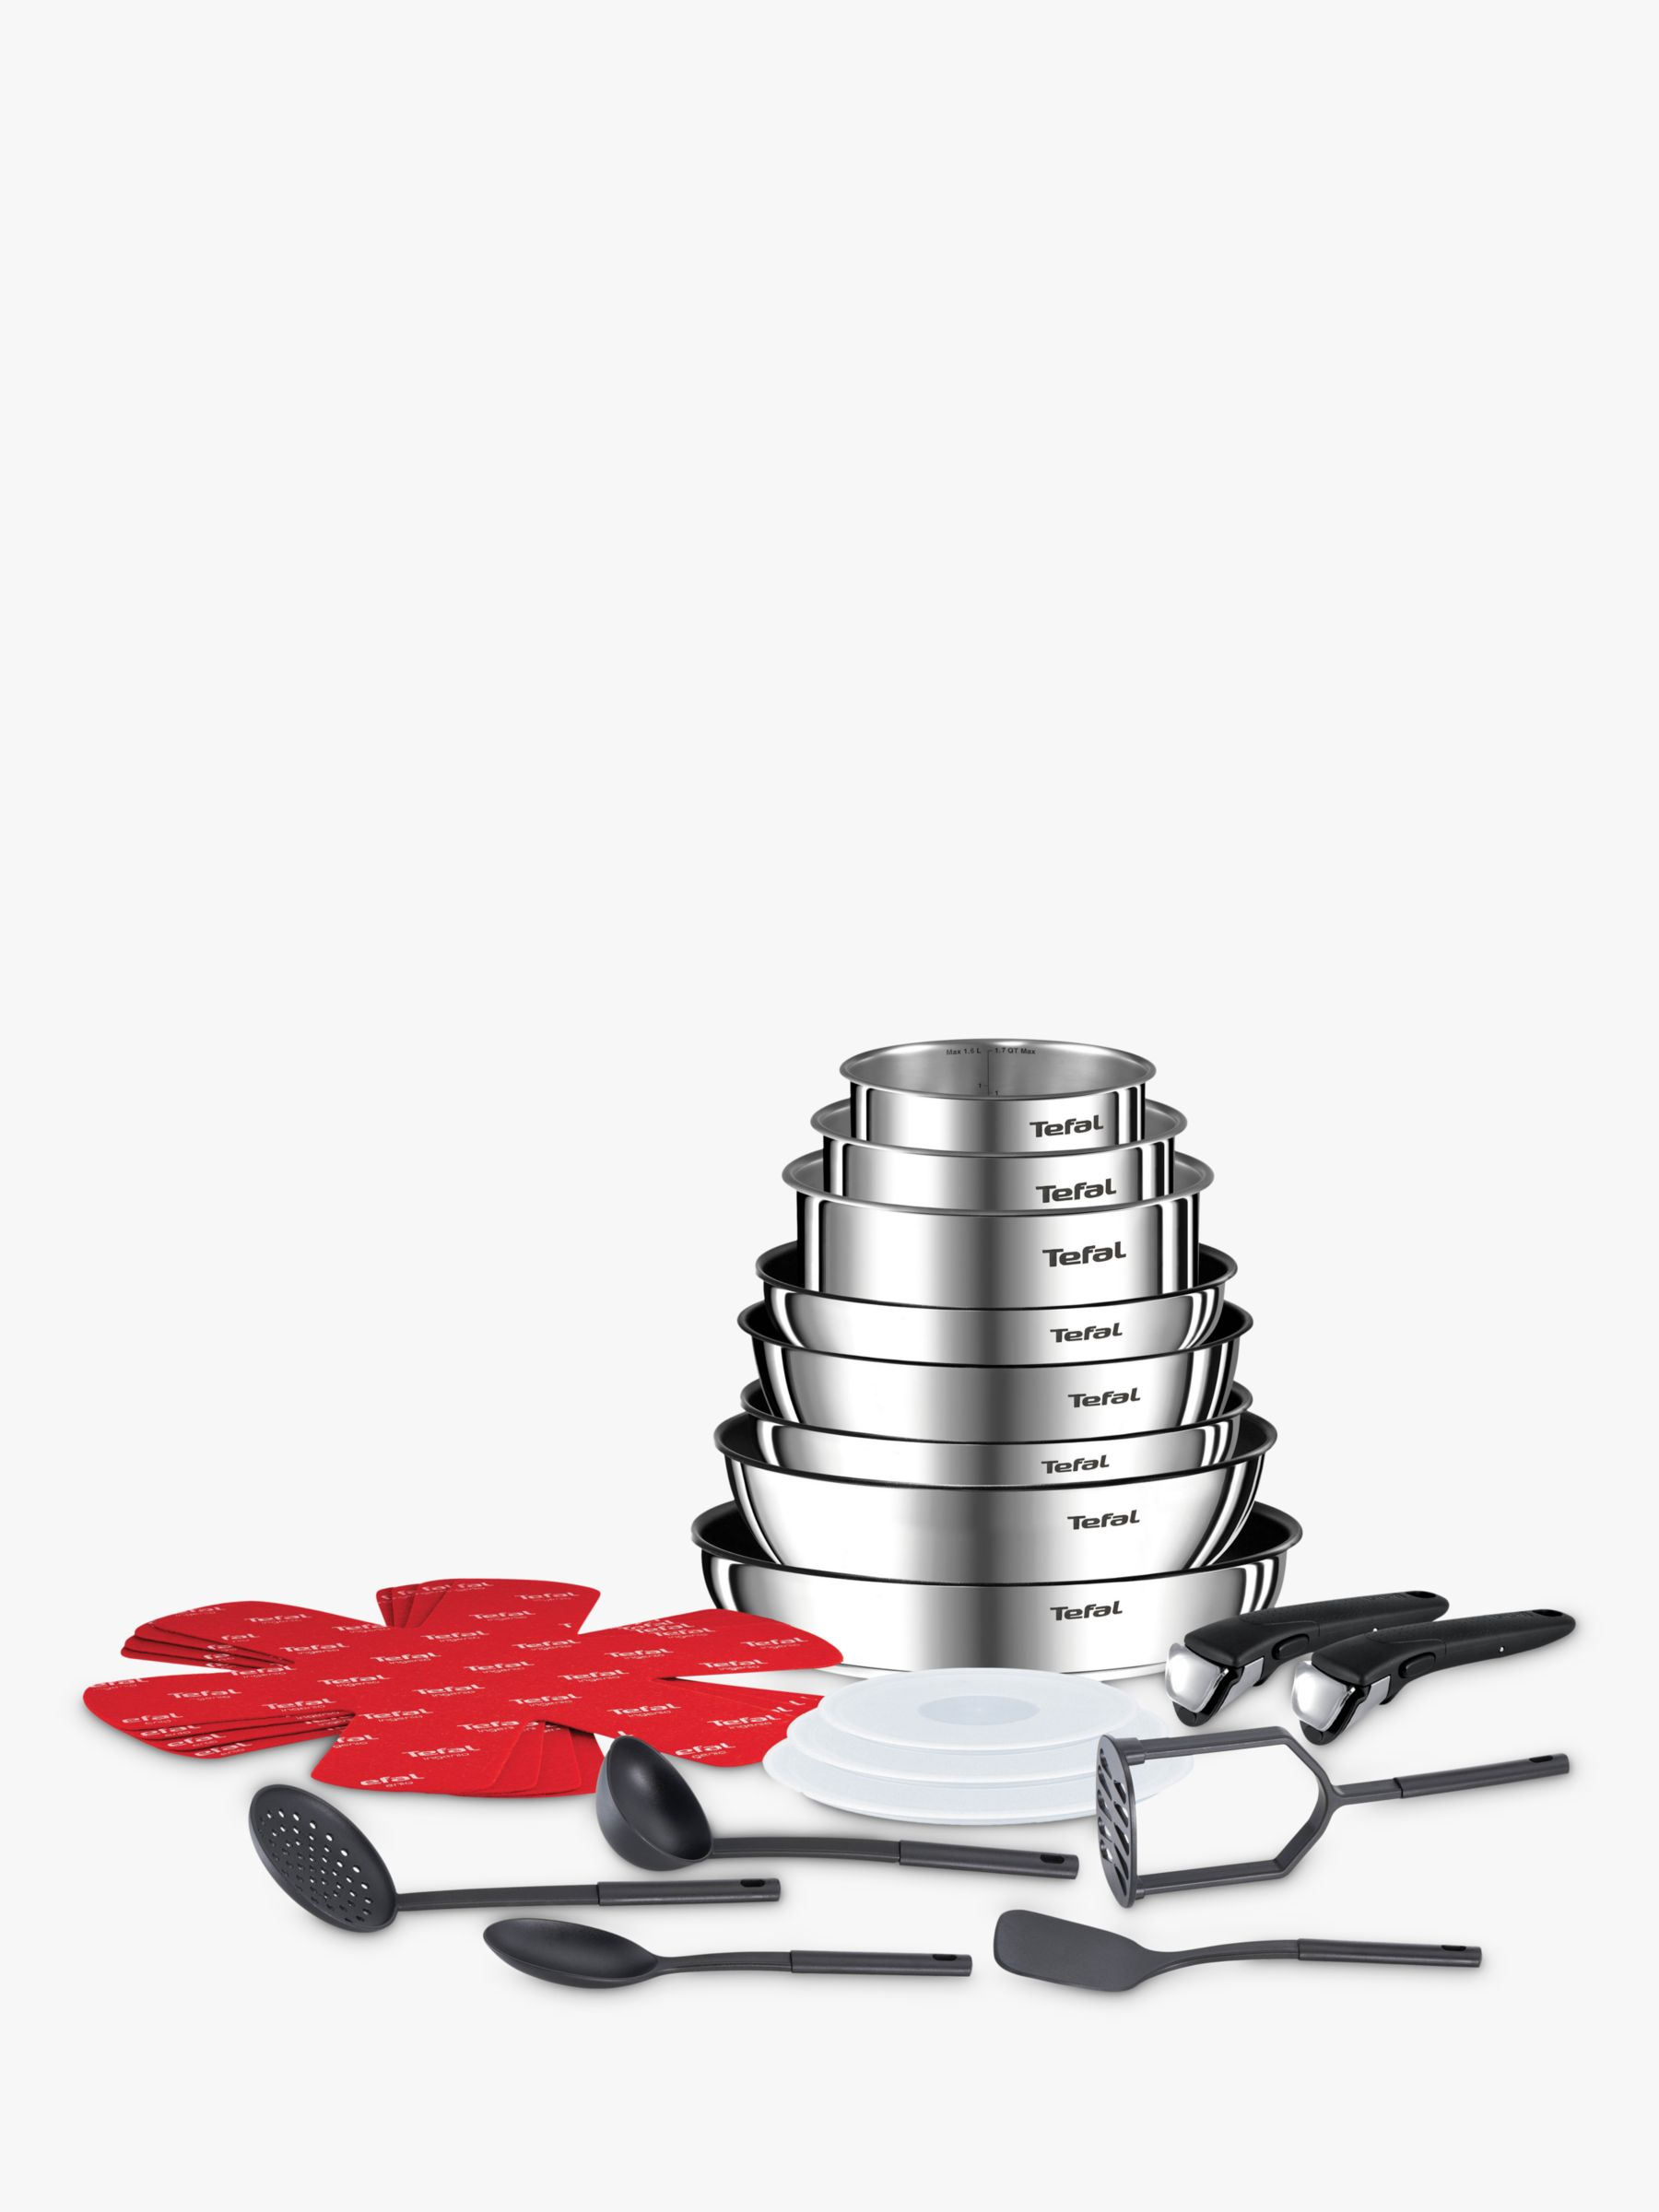 Tefal Tefal Ingenio Emotion Stainless Steel Frying and Saucepan Set, 22 Piece